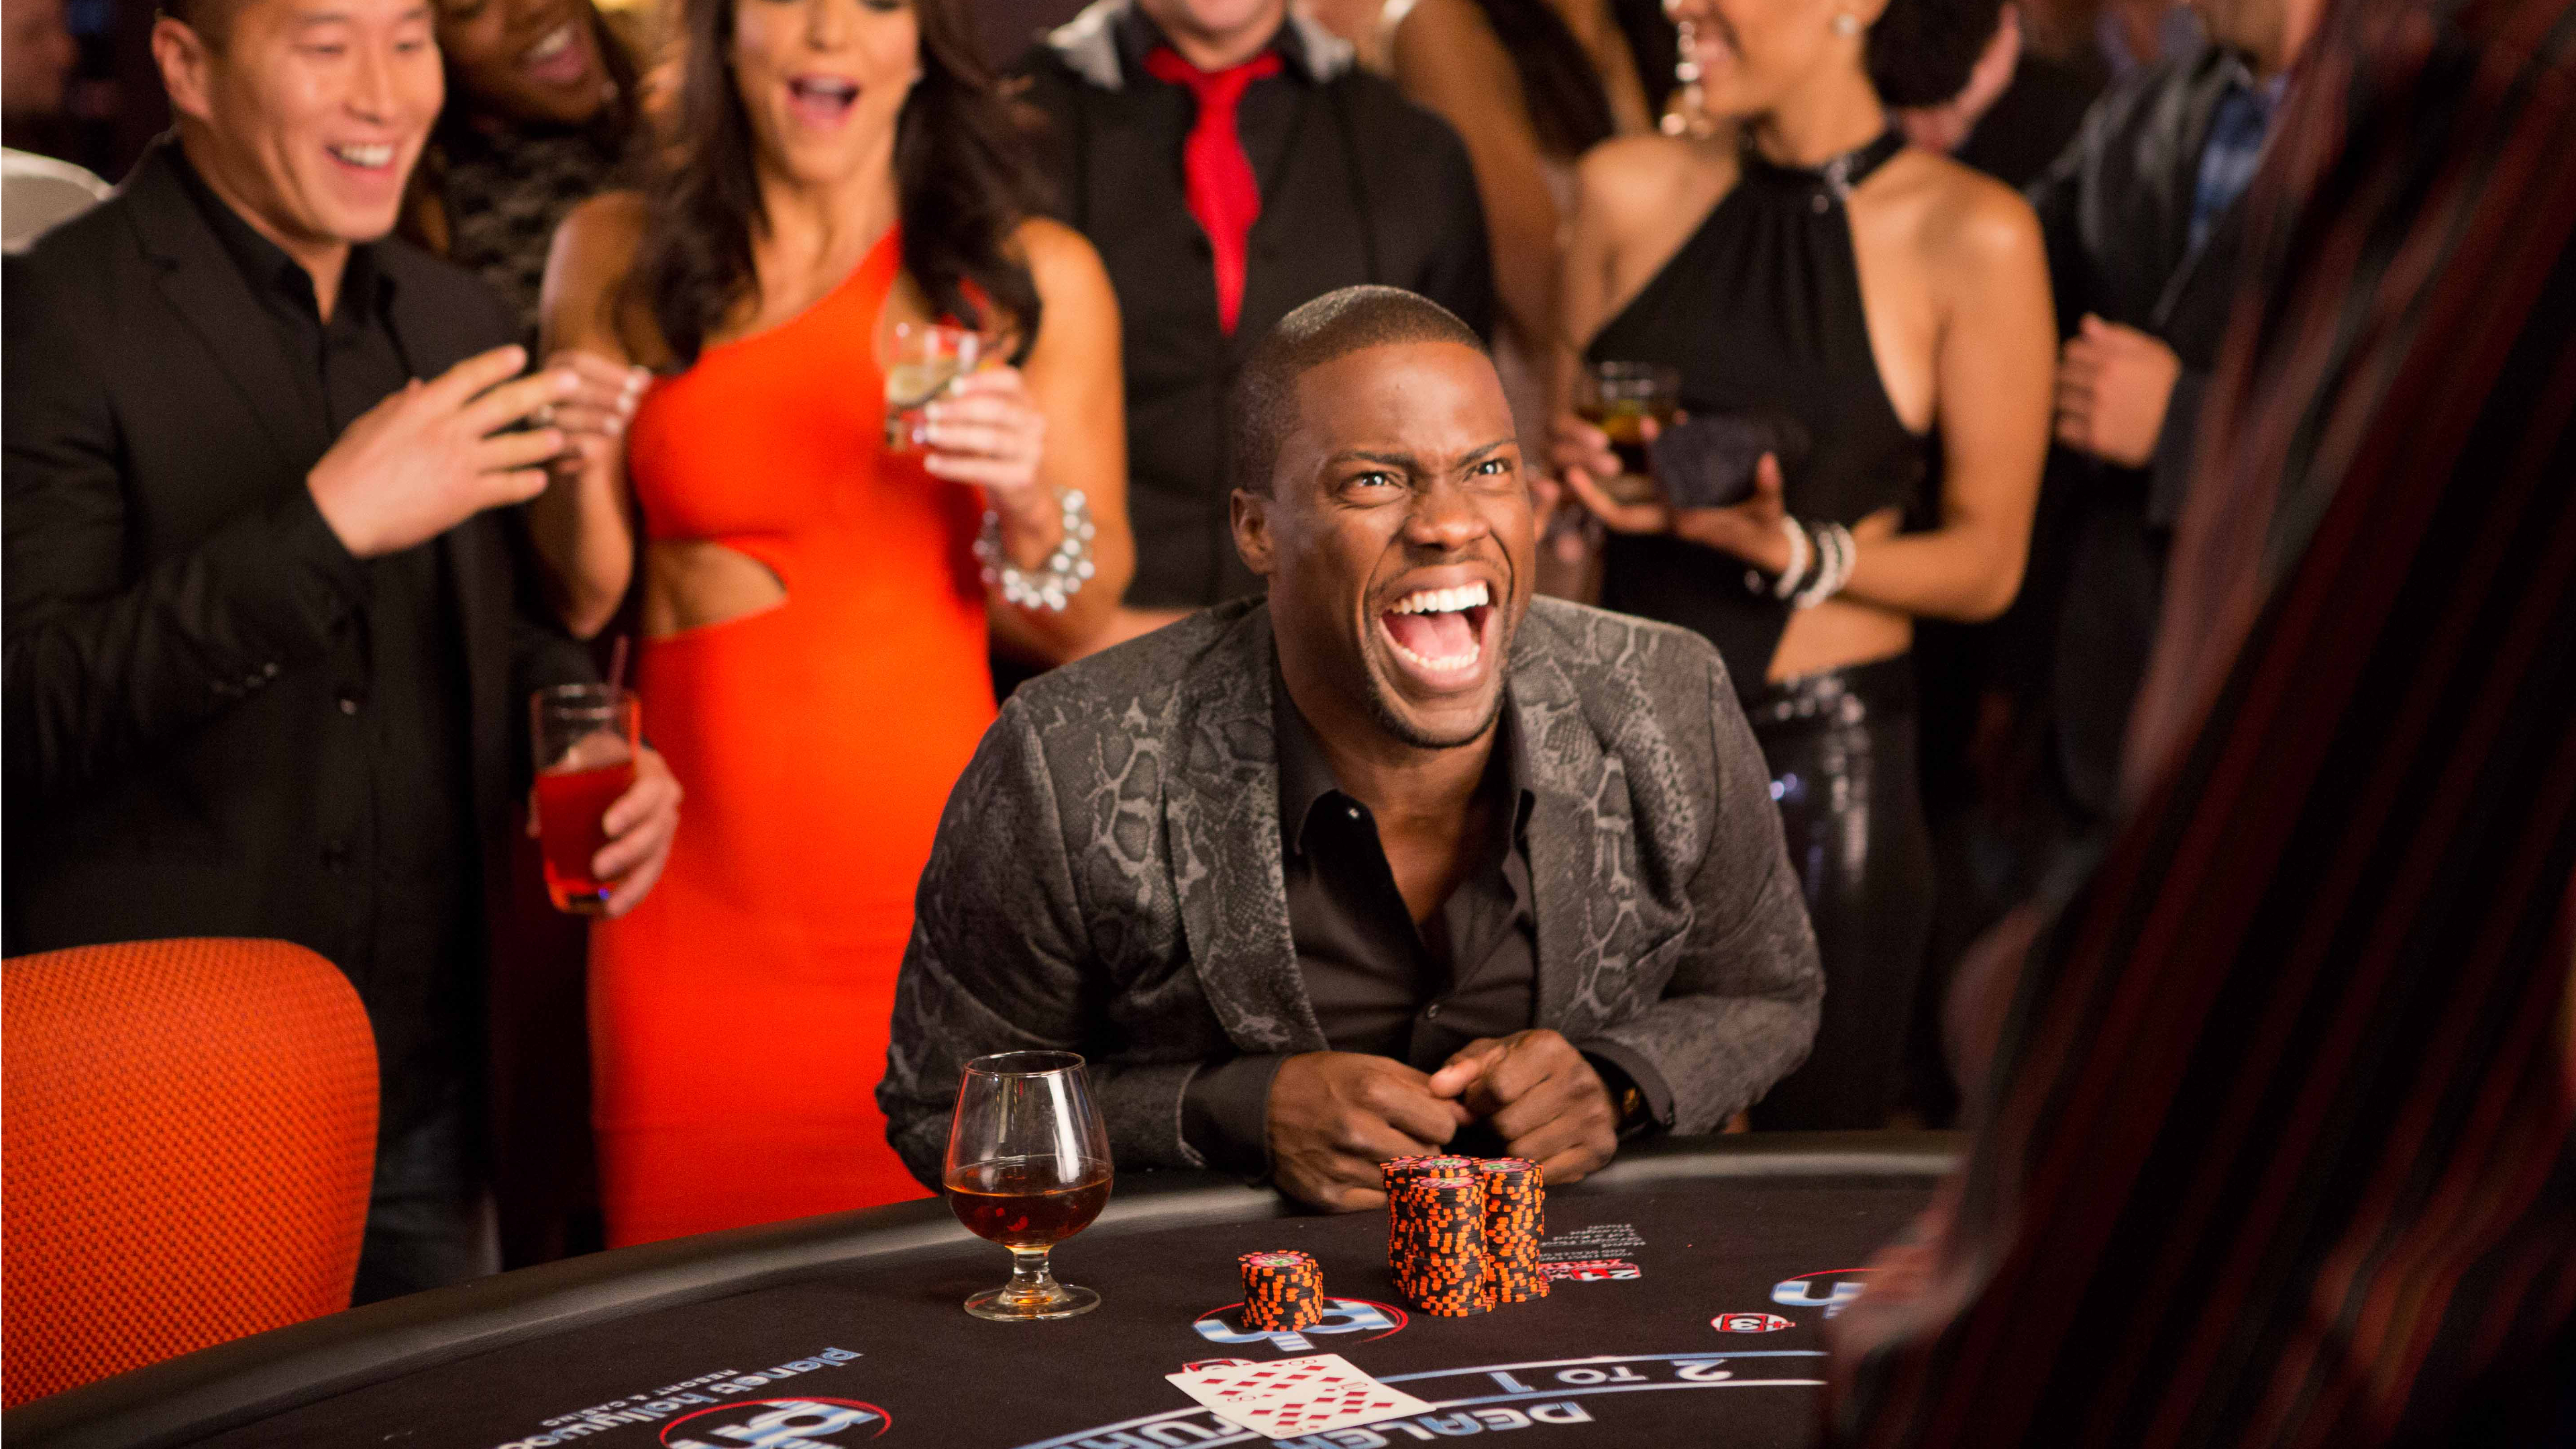 Trailer park boys at casino regina gambling addiction counselors columbus ohio